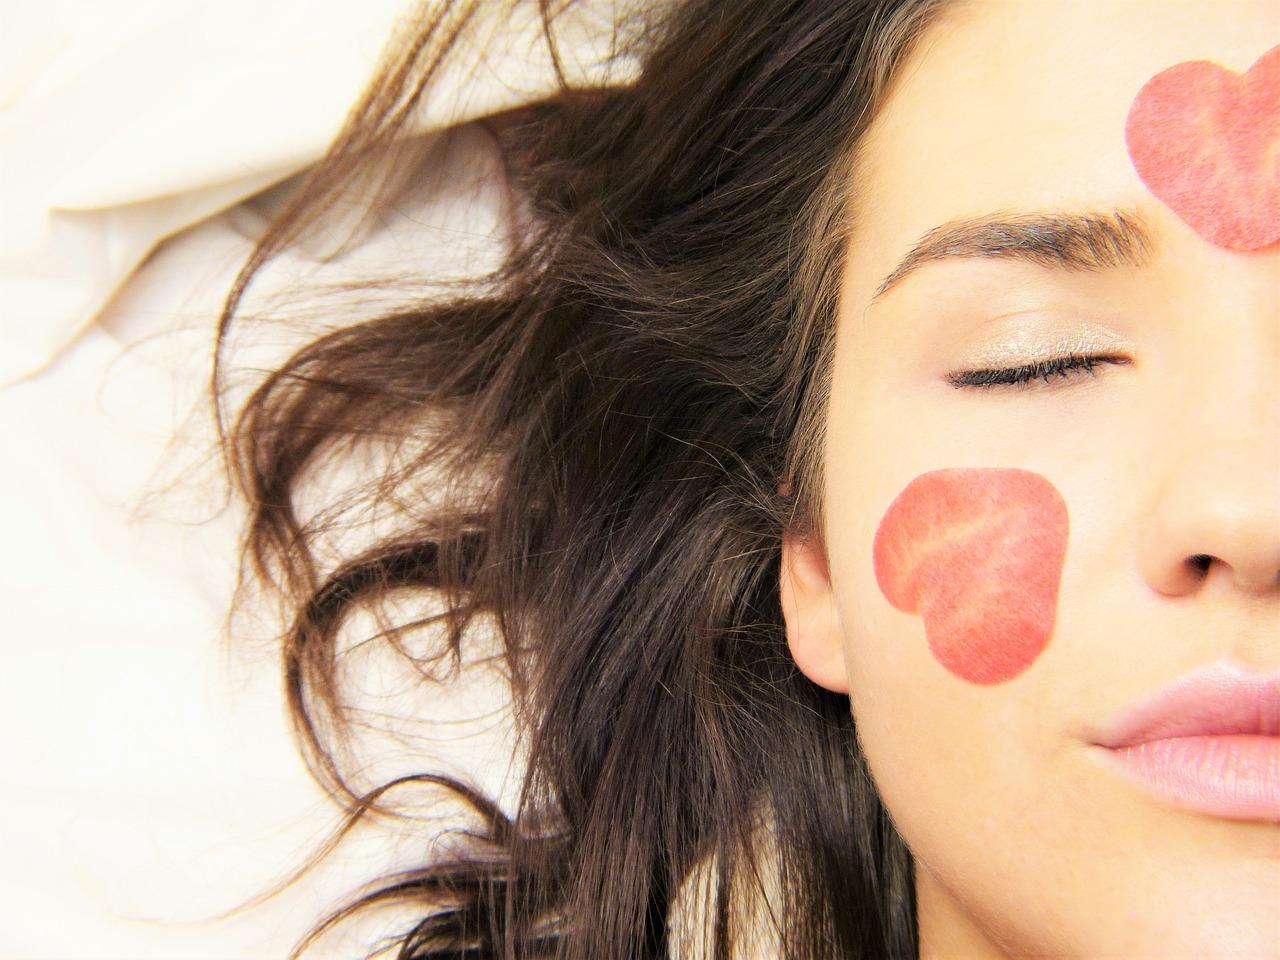 Kosmetik, Gesicht, Frau, Beauty, Hautpflege, KOSHO, Skincerely Yours, 8sam, Blattkultur, Anja Frankenhäuser, Schminktante